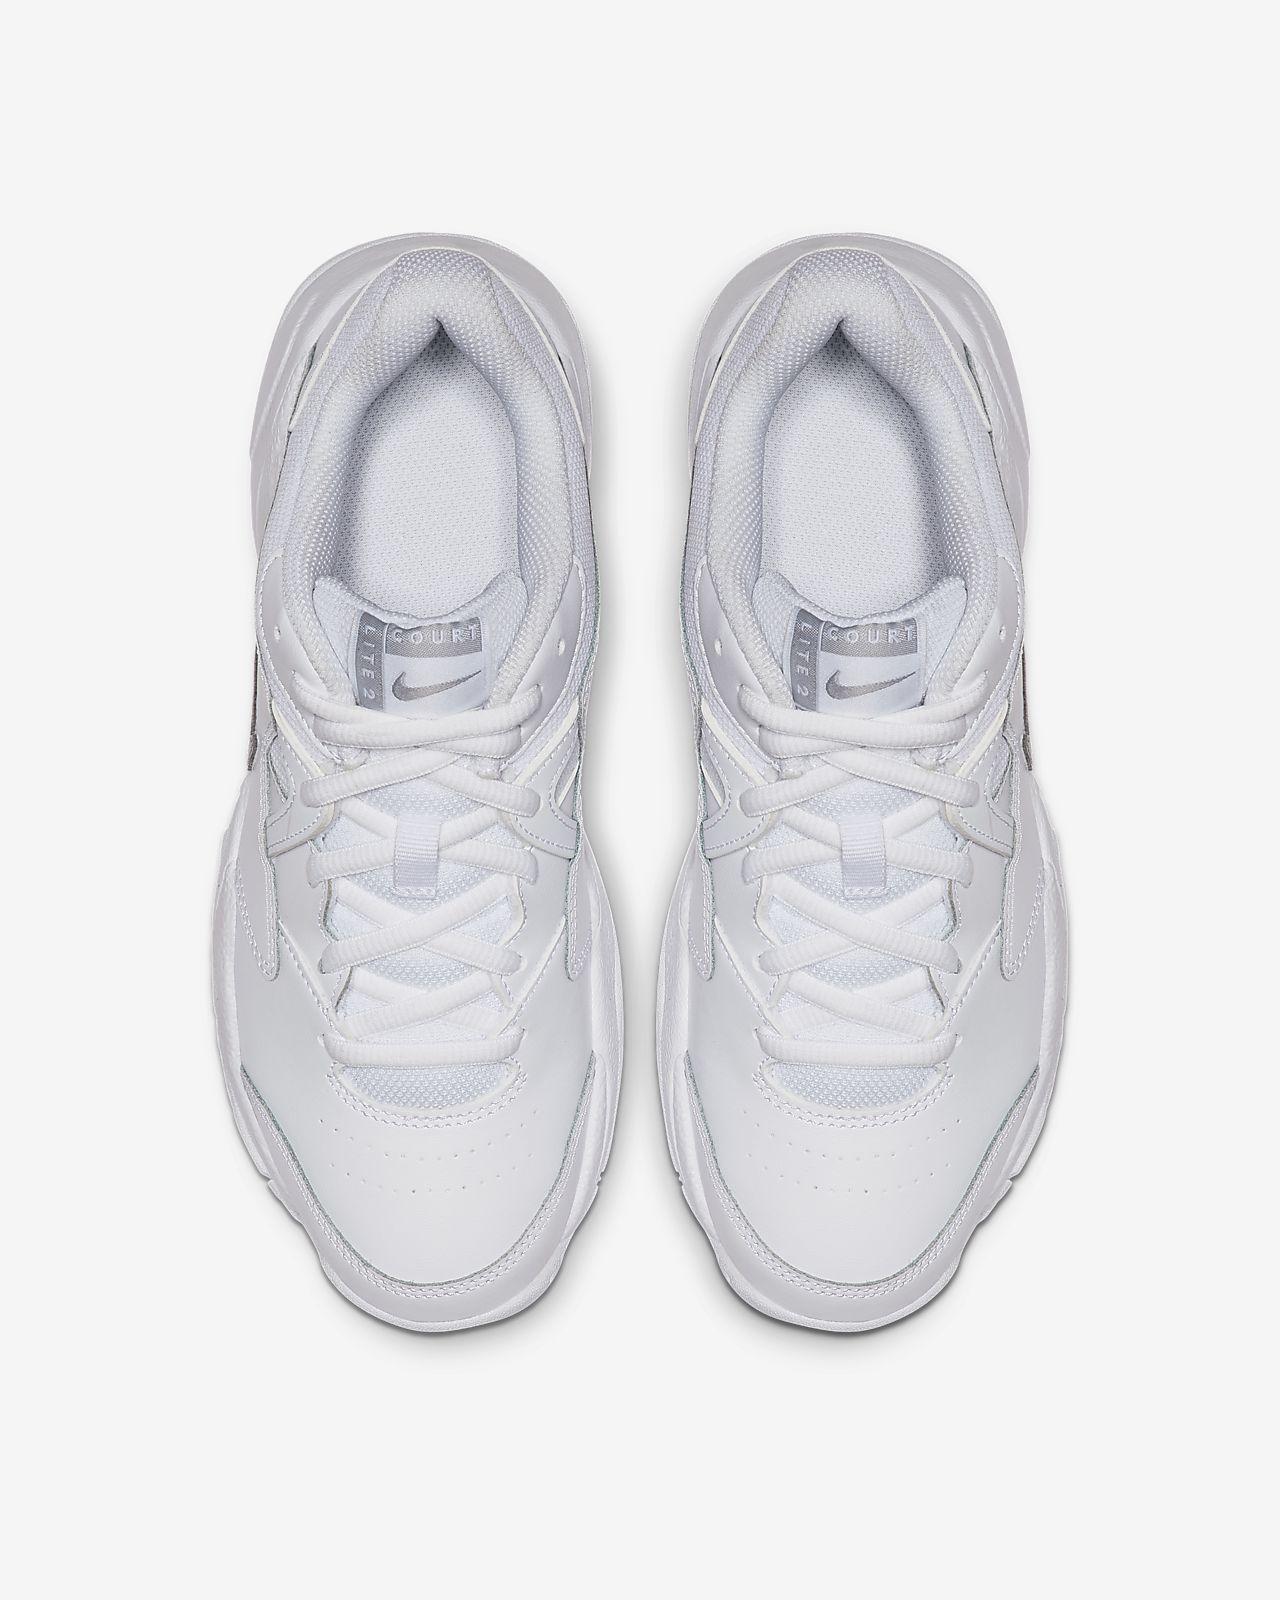 Women's Nike Court Lite 2 Tennis Shoes   AR8838 101   Tennis